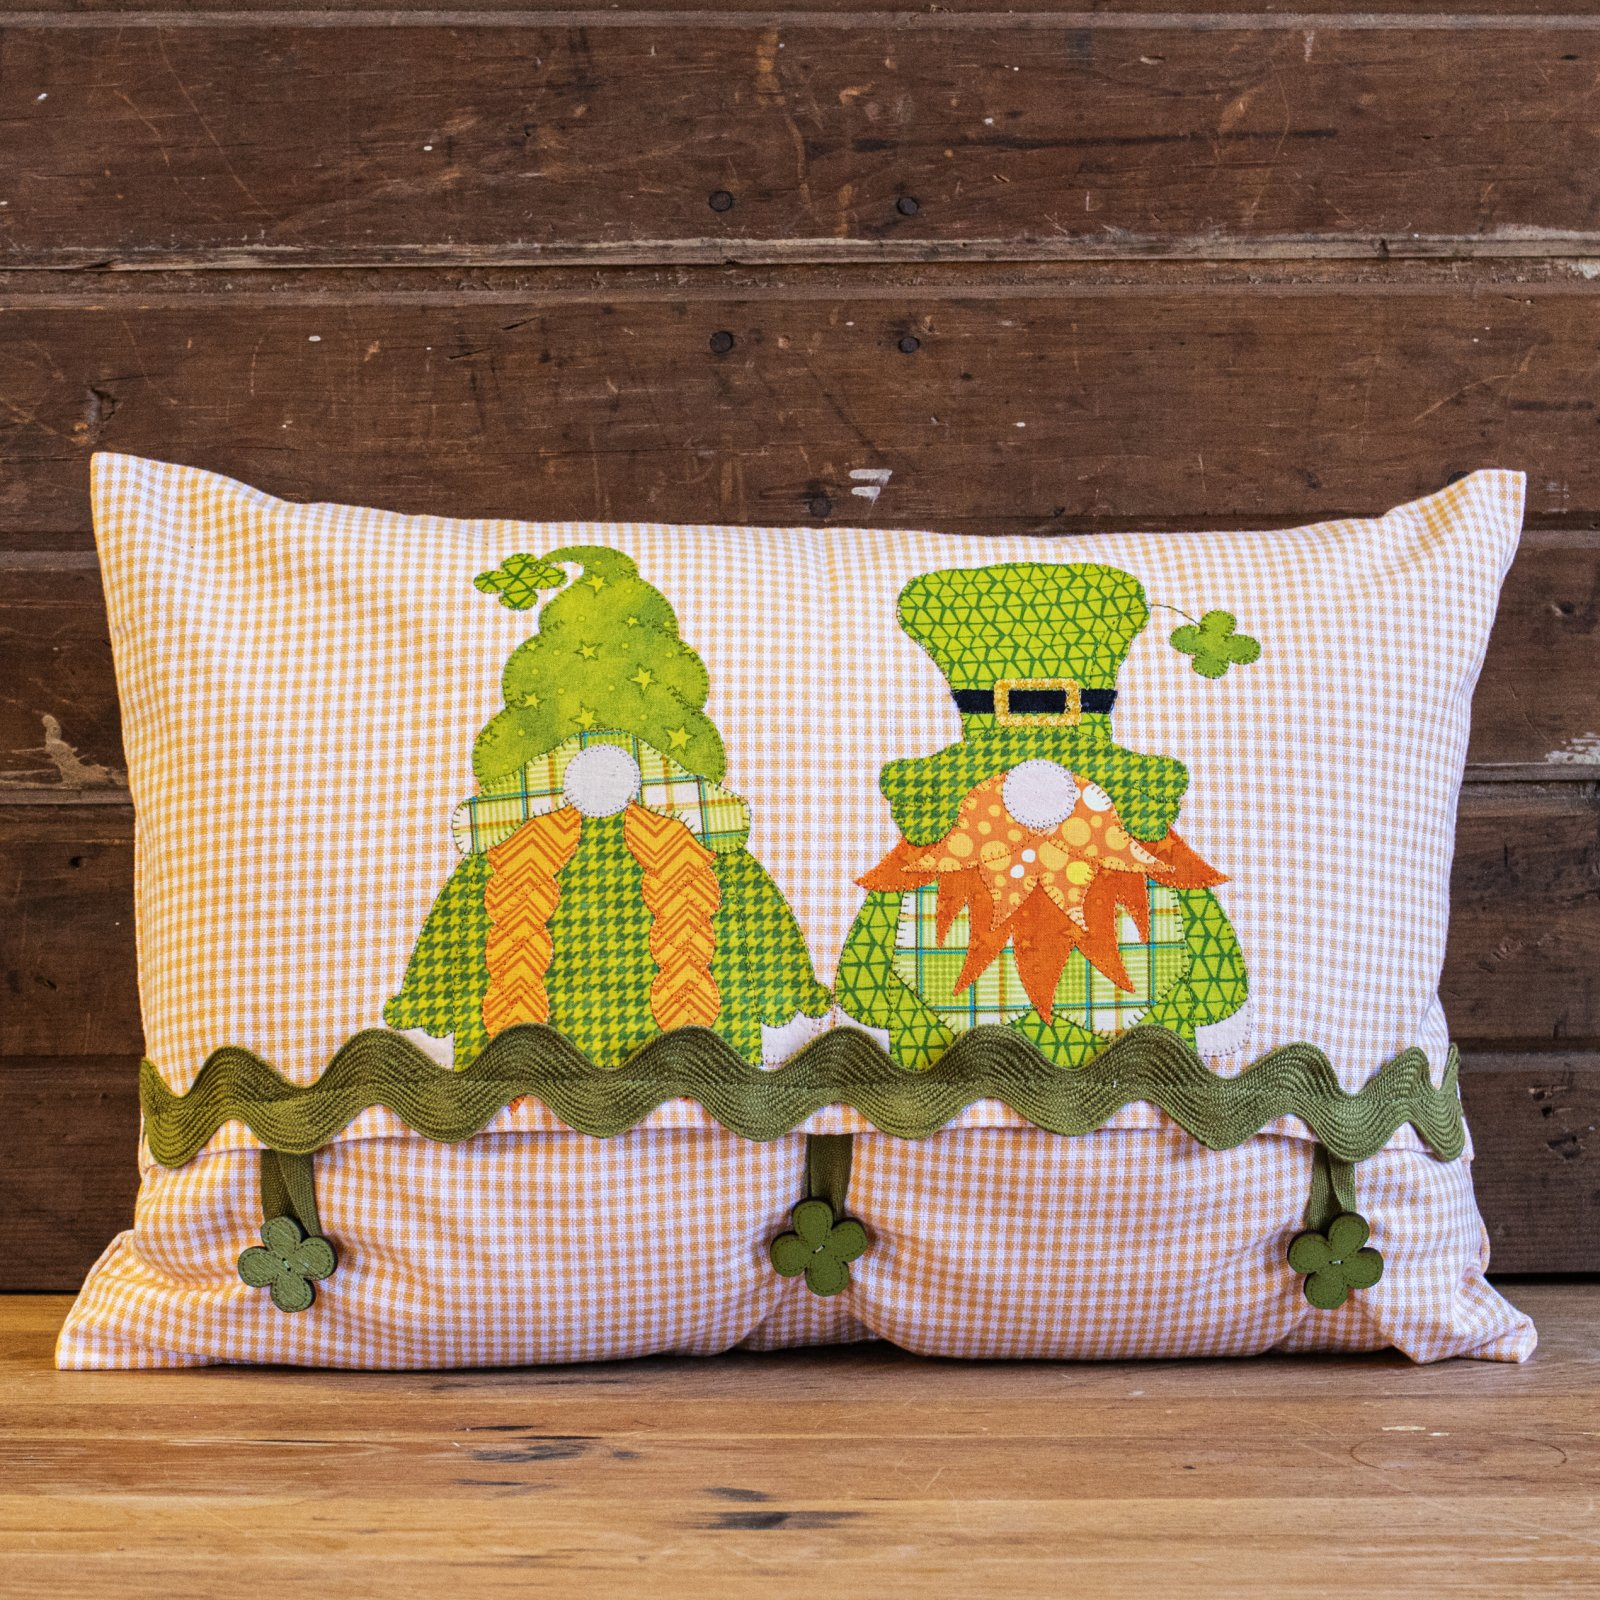 Irish Gnomes Applique Pillow Cover Kit